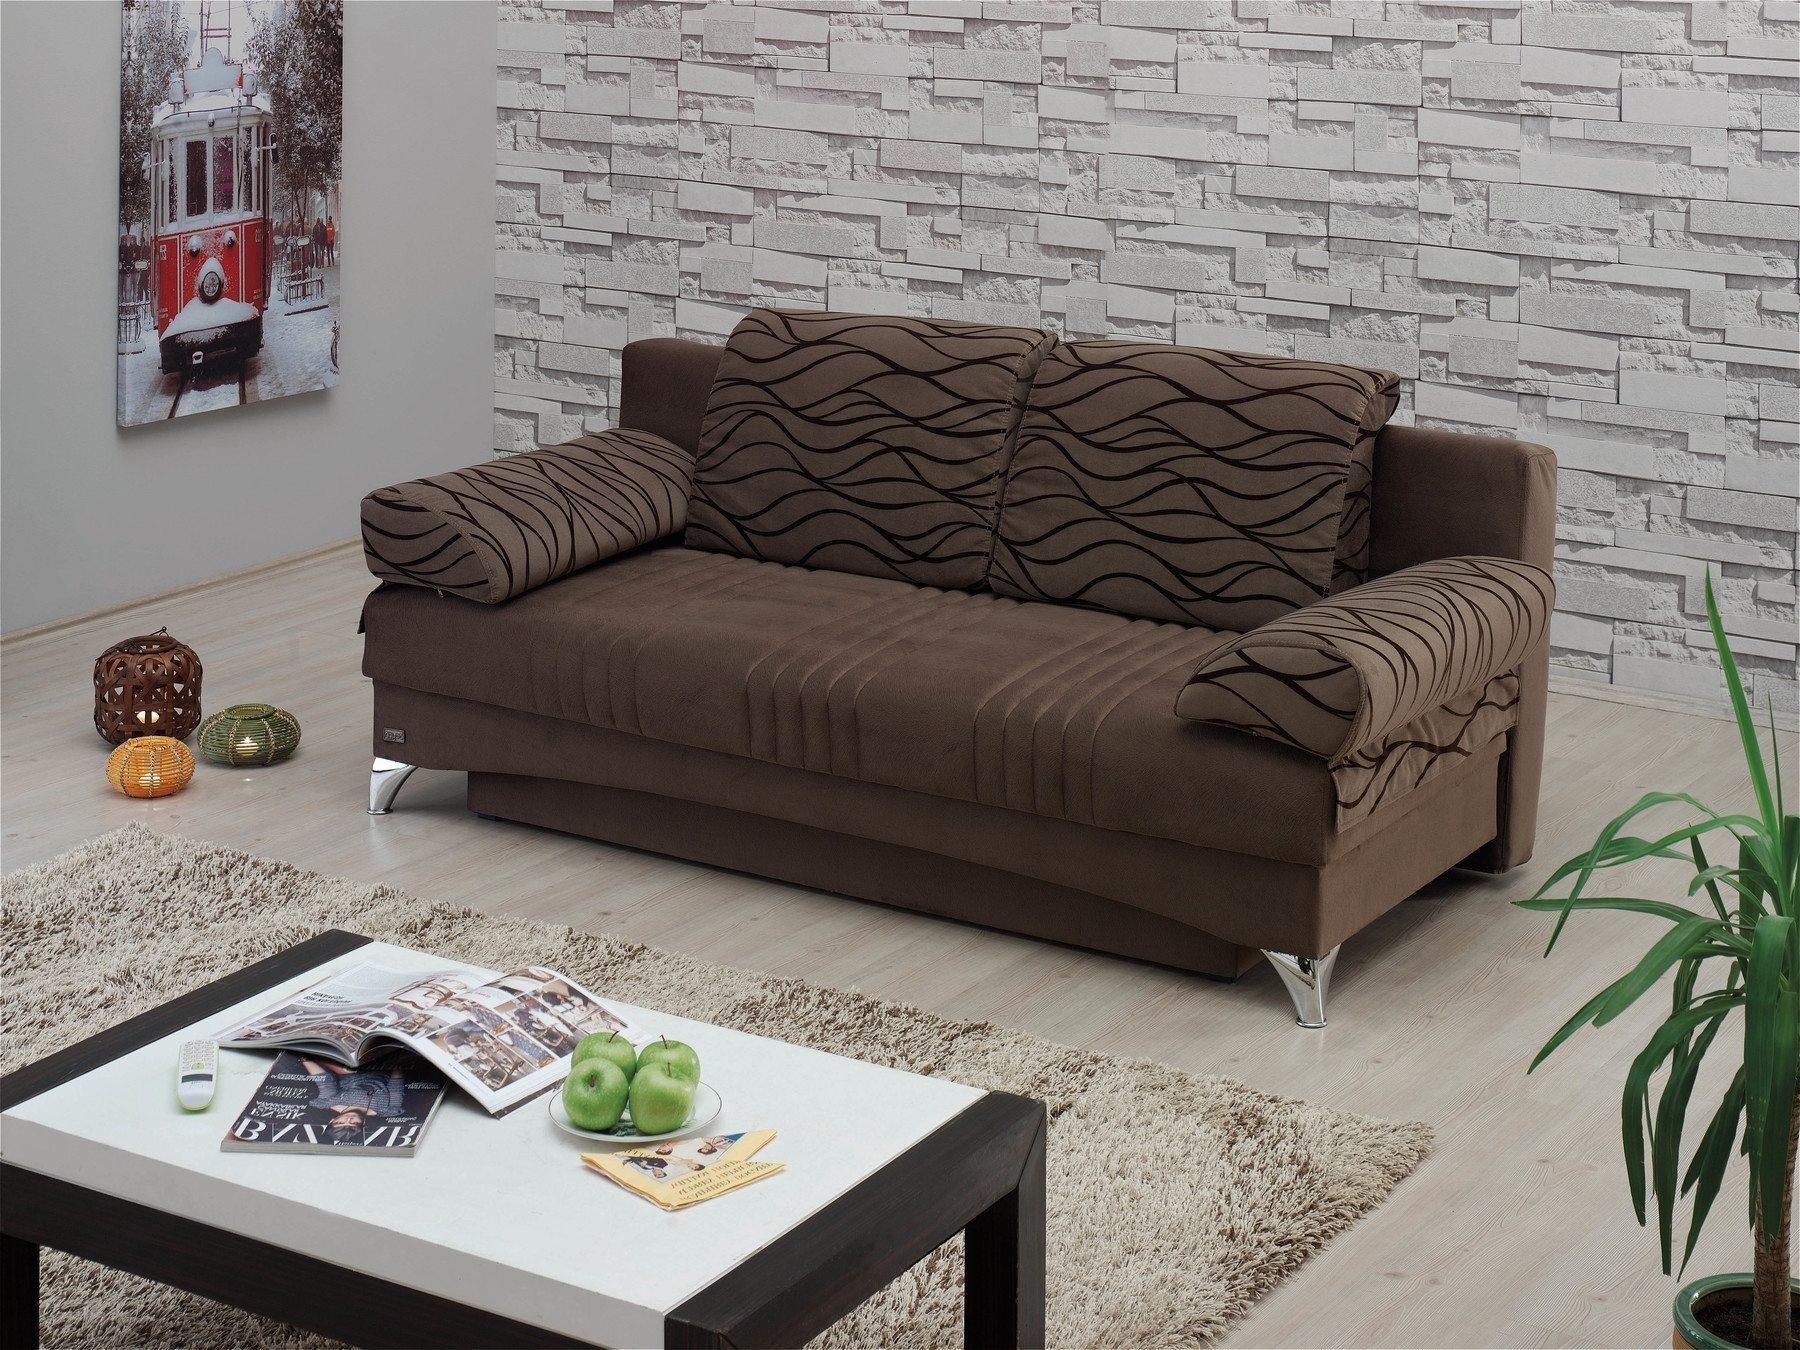 sofa sleeper san francisco simple wooden bed 20 photos sofas diego ideas